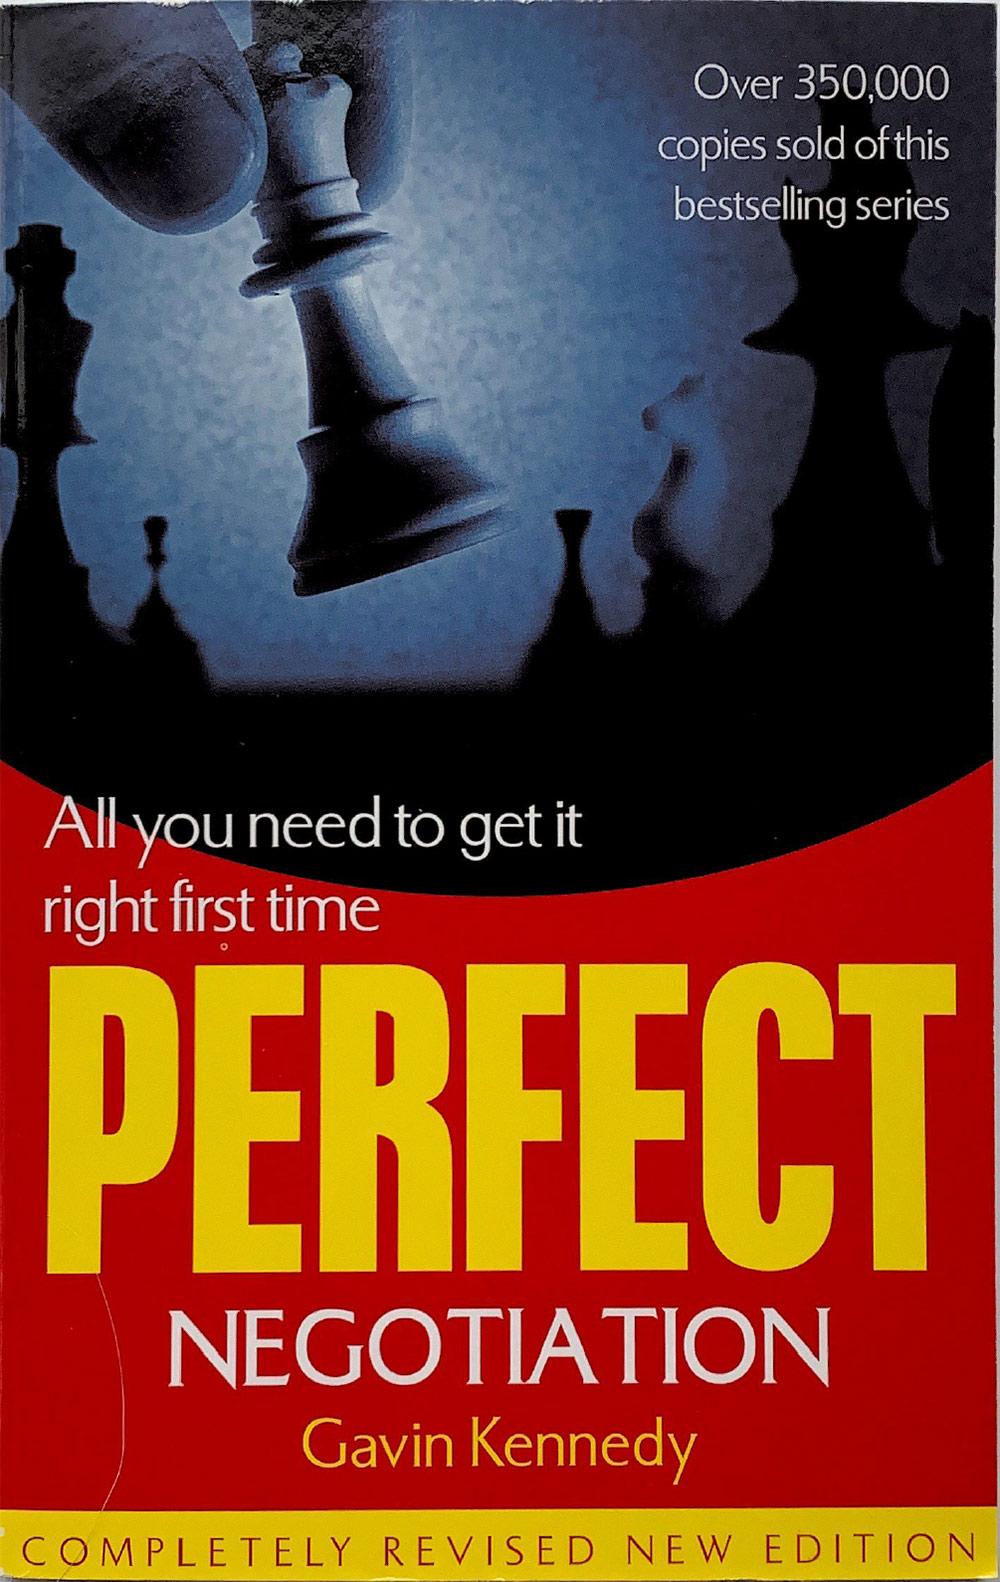 Perfect Negotiation Book by Gavin Kennedy